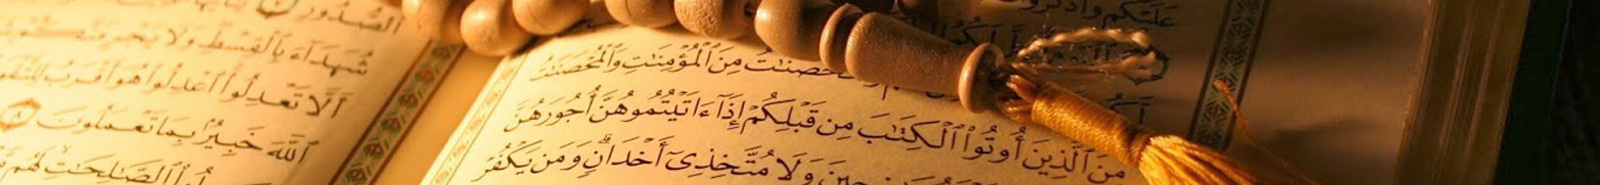 Isha Prayer in British Summer| Leeds Grand Mosque